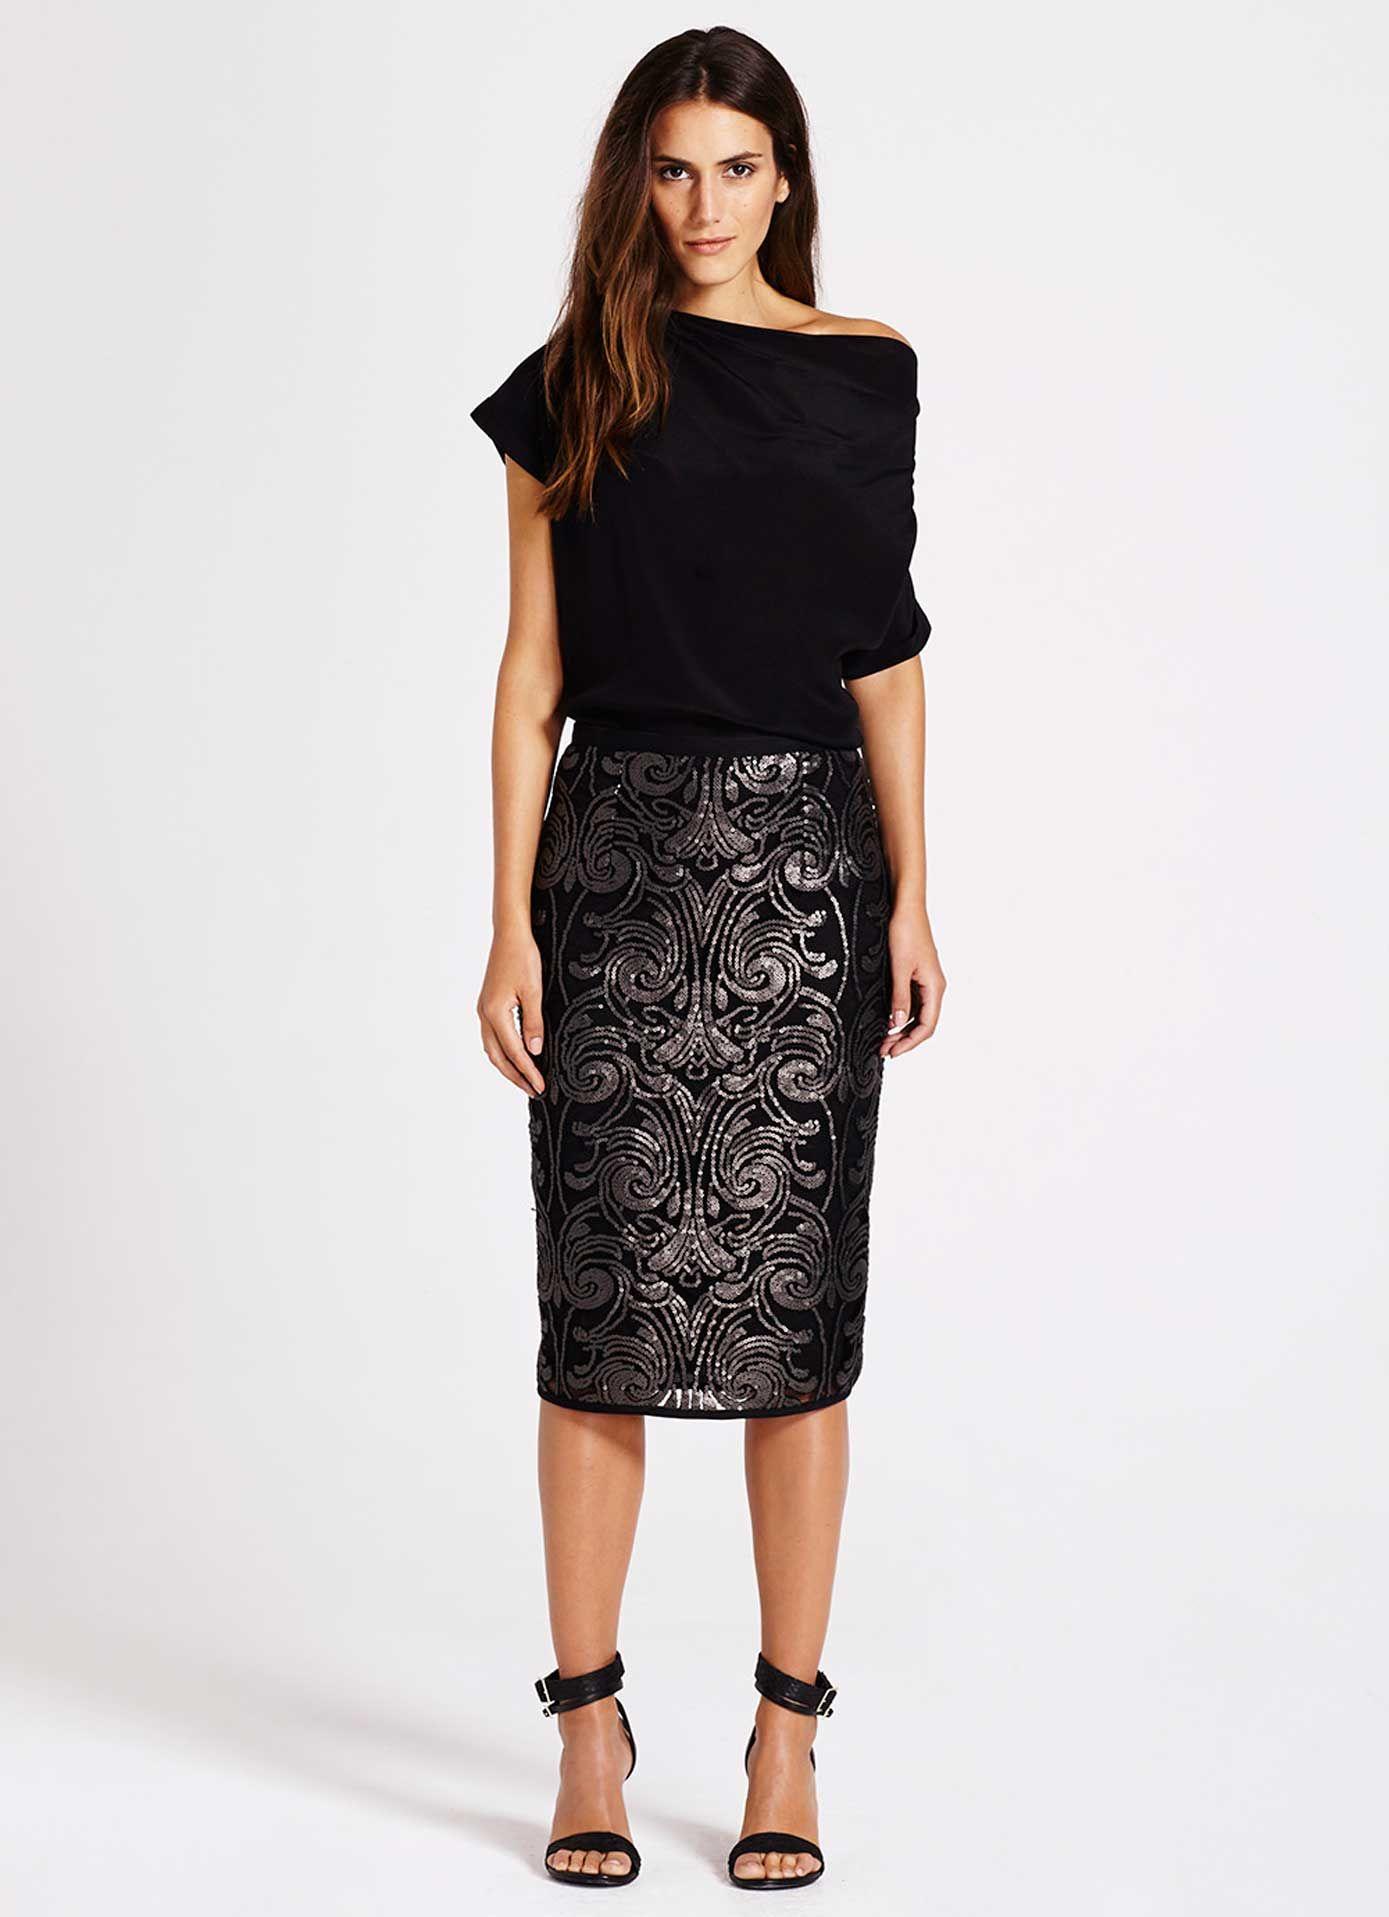 c99c95eaac08 Baroque Sequin Pencil Skirt in 2019 | Fashion | Sequin pencil skirt ...